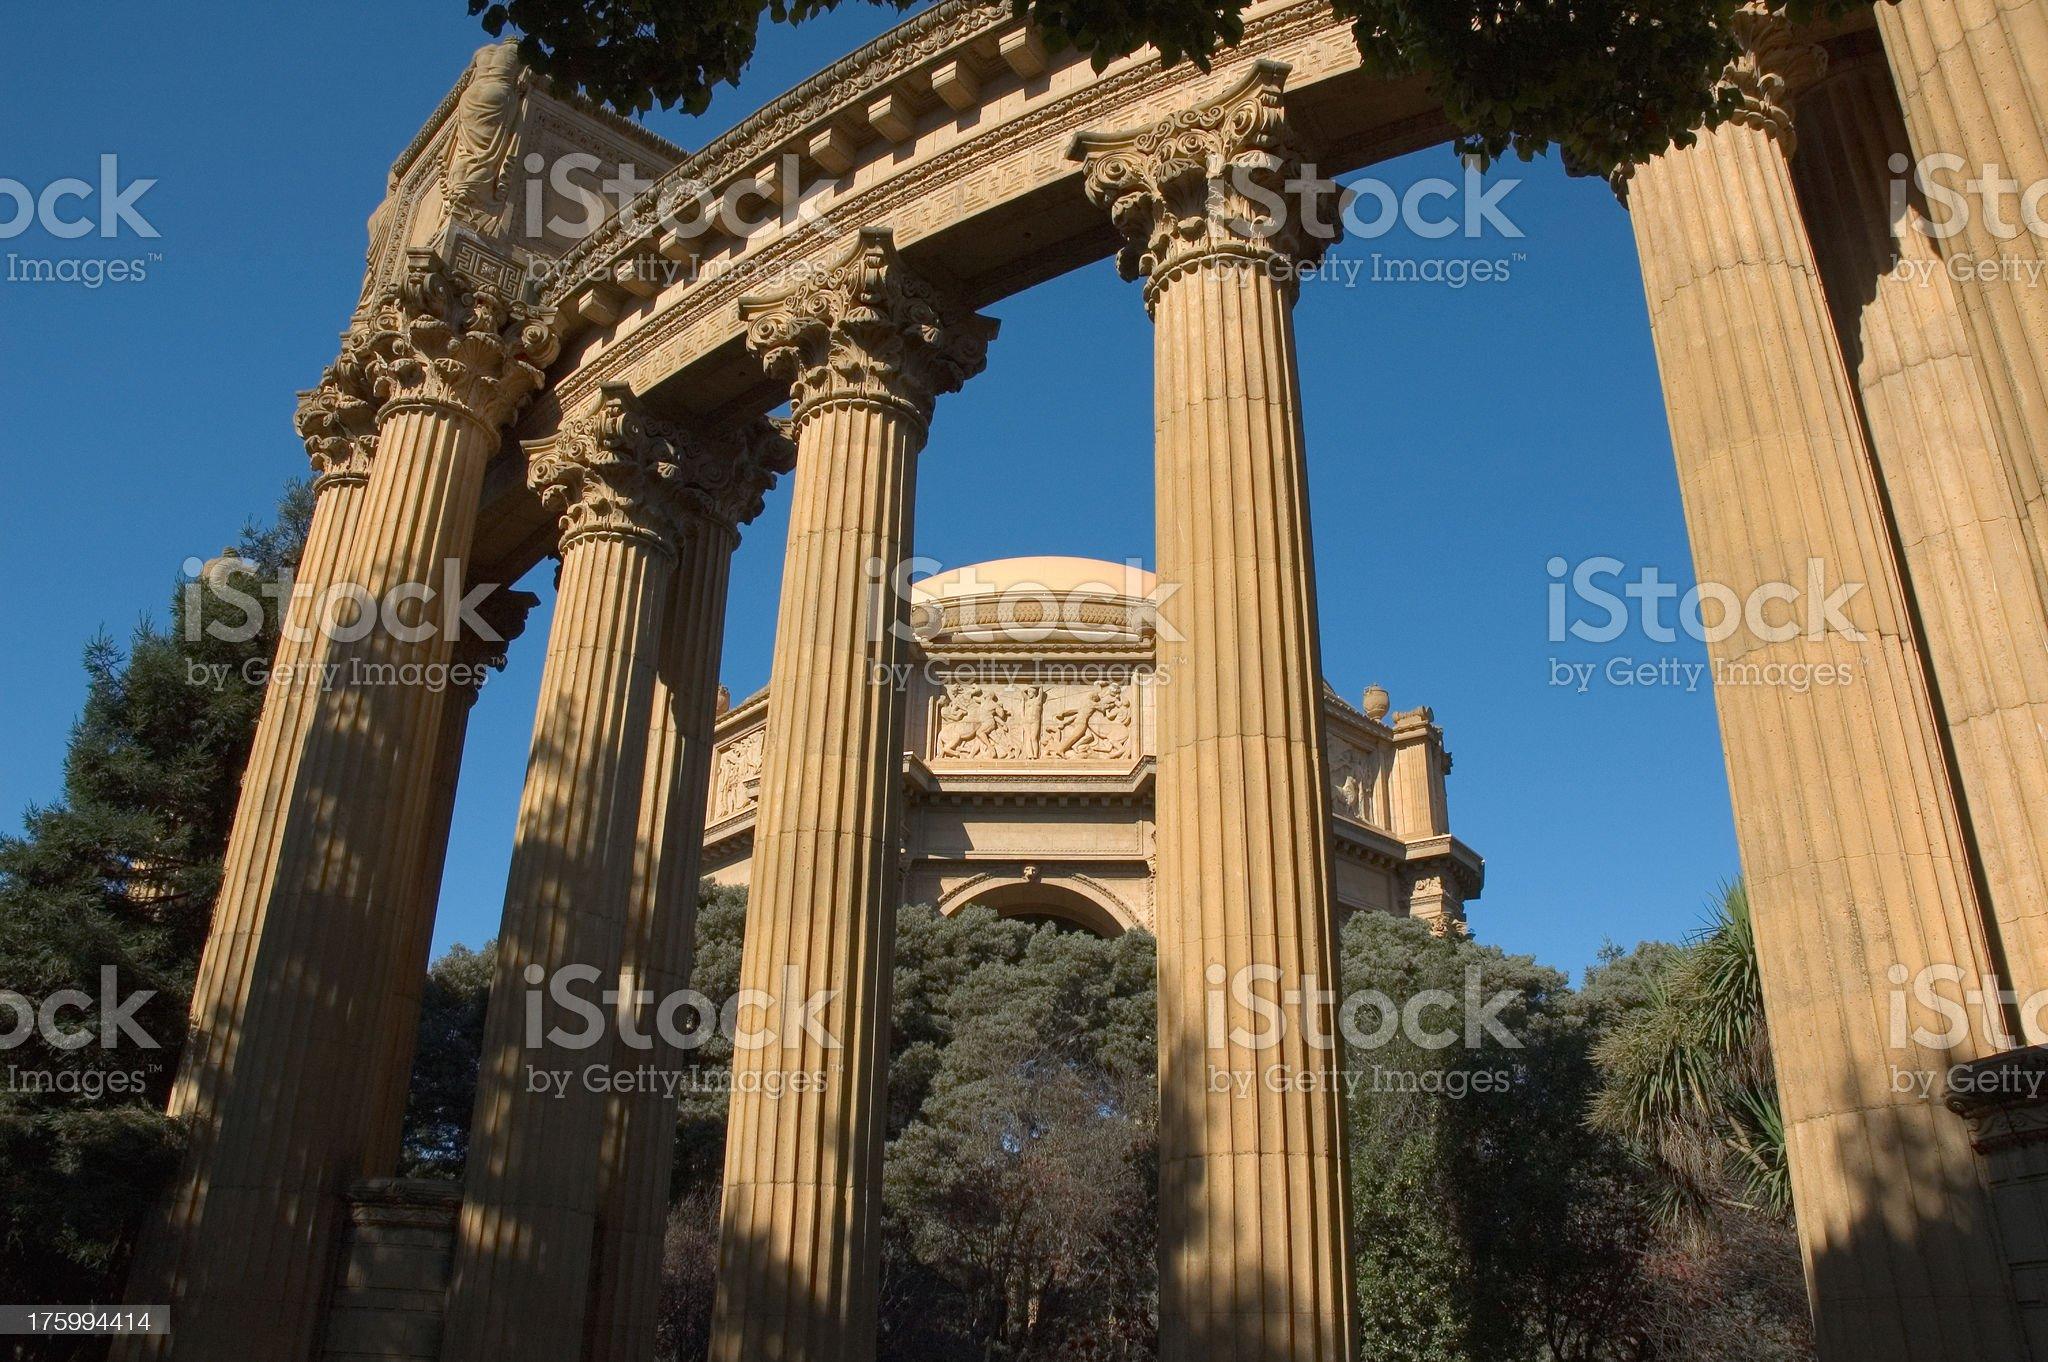 Palace of Fine Arts San Francisco royalty-free stock photo